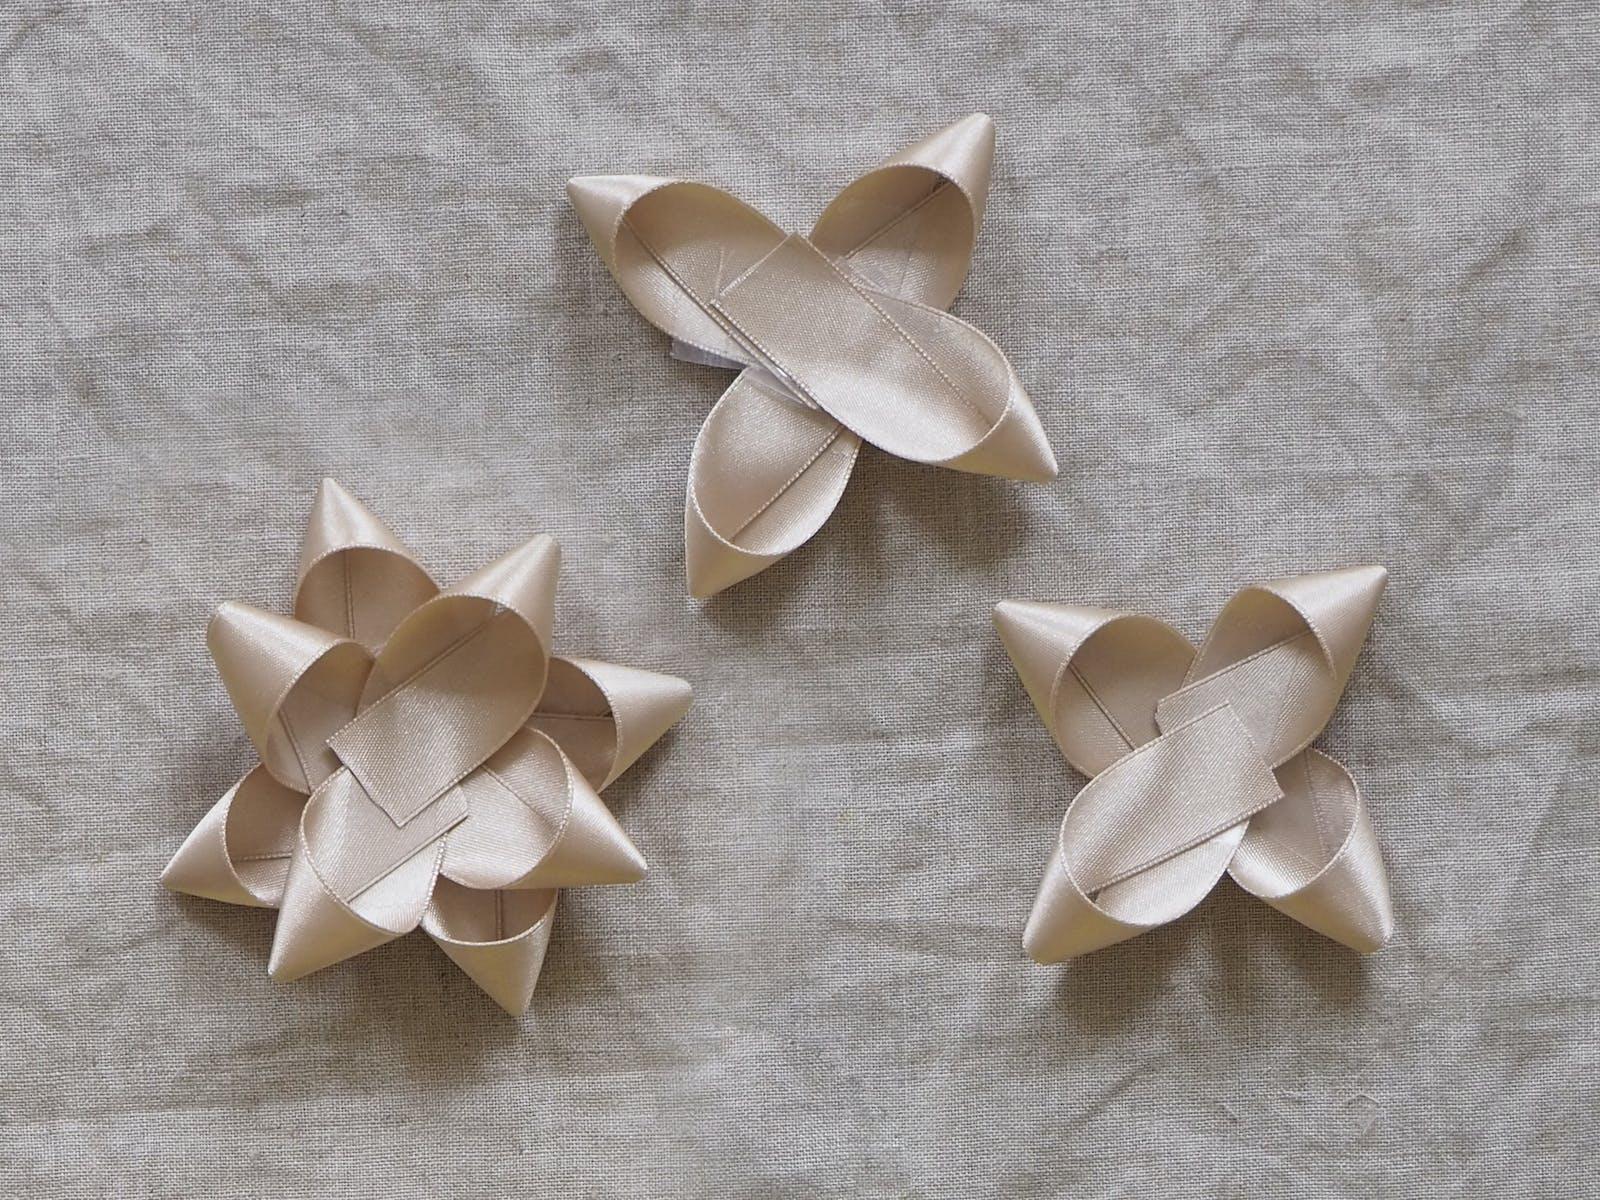 Homemade ribbons